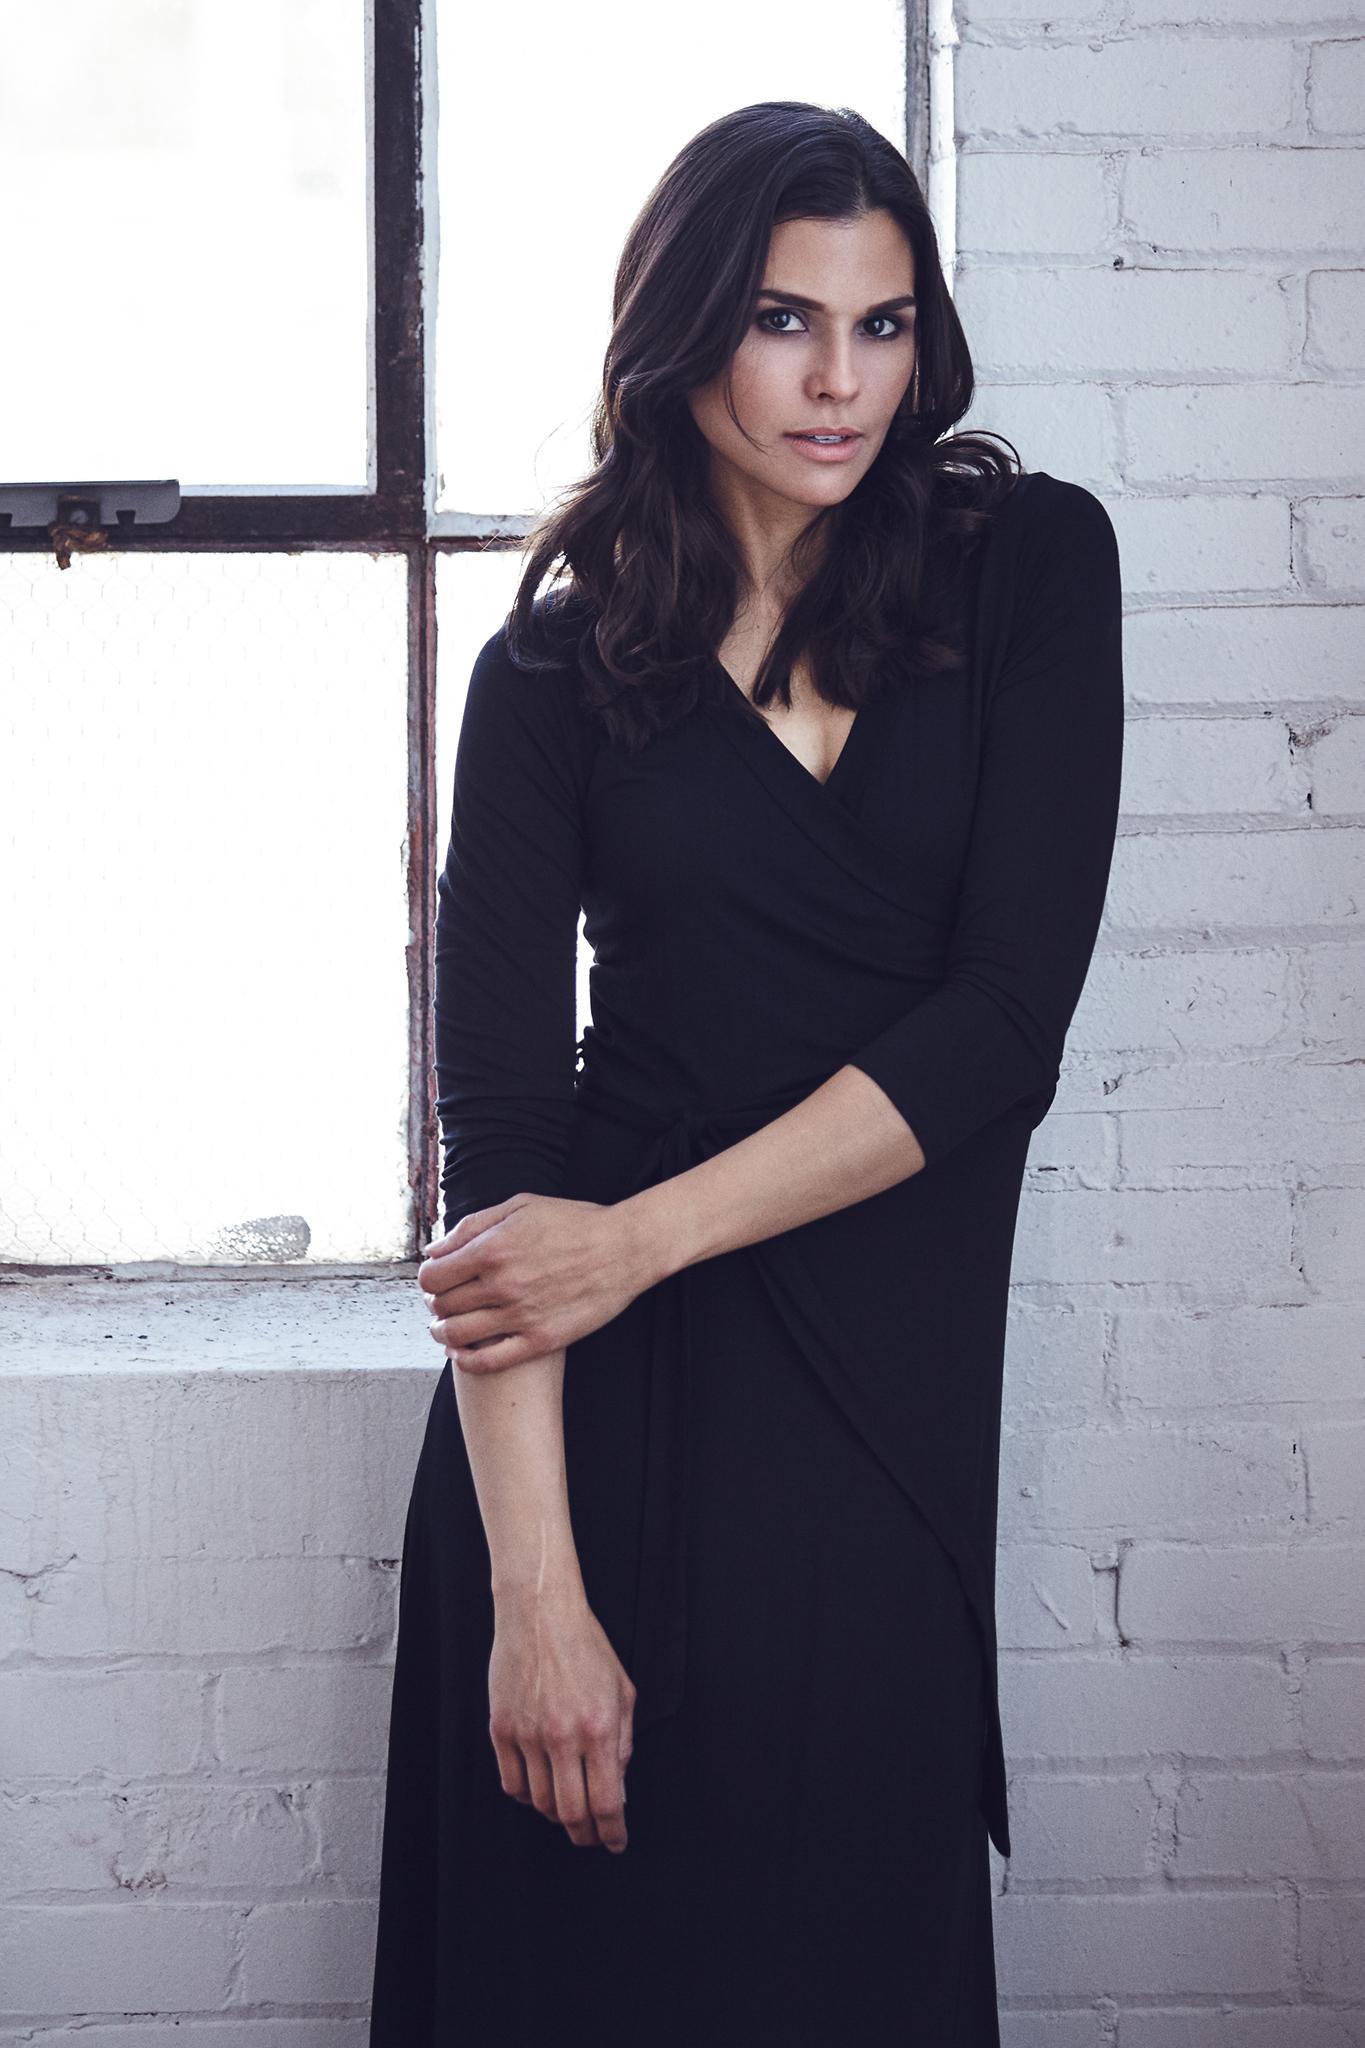 Nicole_Peelman_Portrait_Commercial_Model_Fashion_Shoot_Minneapolis_Photographer_Joe_Lemke_005.jpg